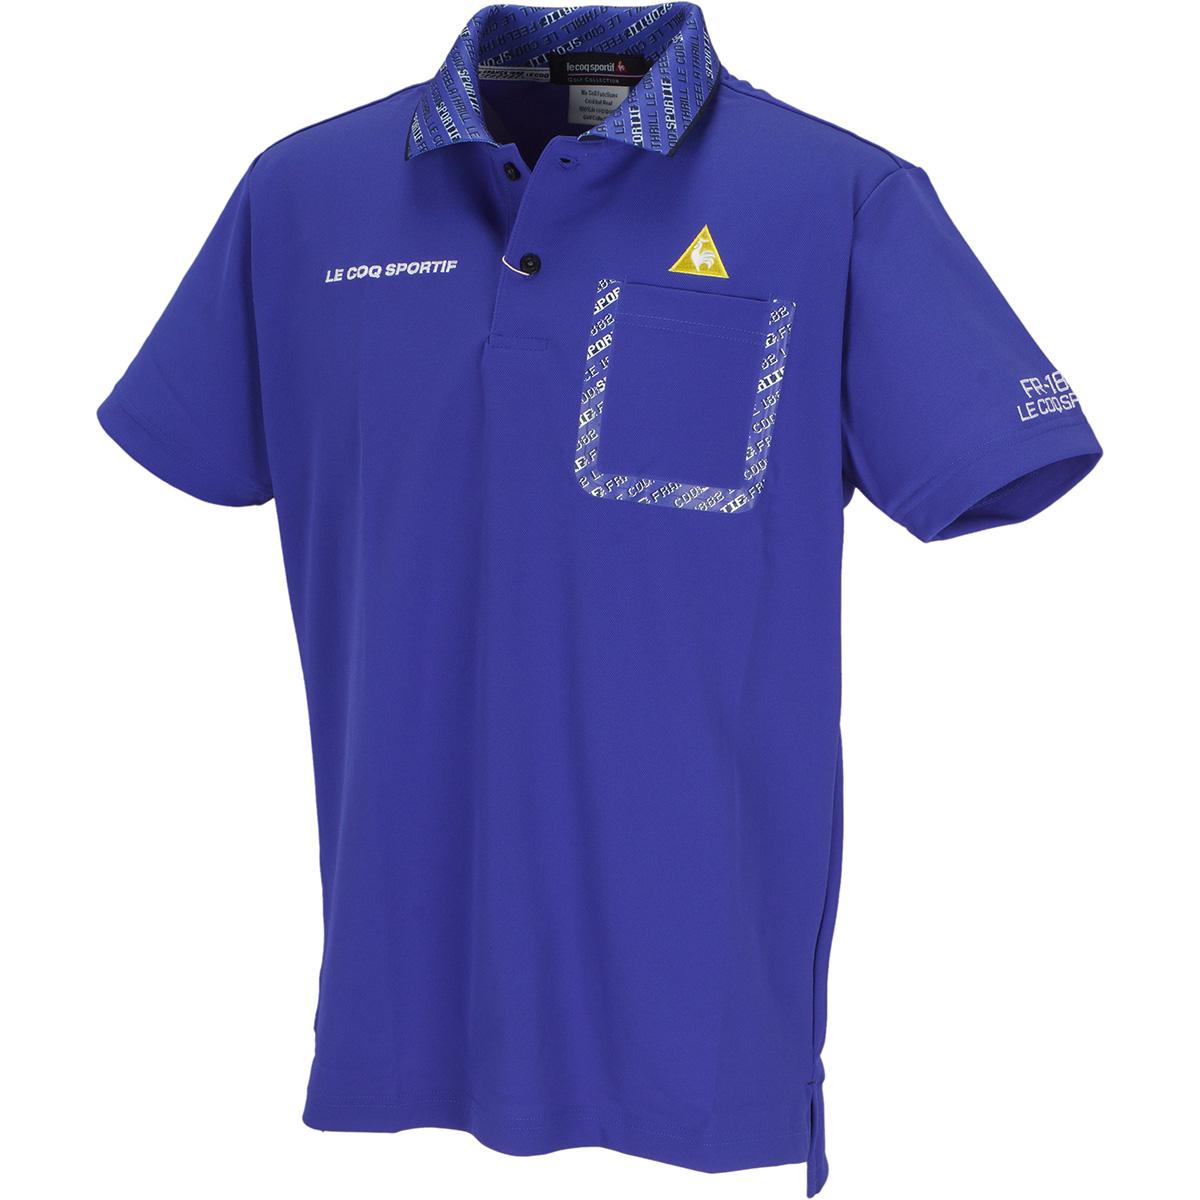 8bitロゴプリントカラー 半袖ポロシャツ